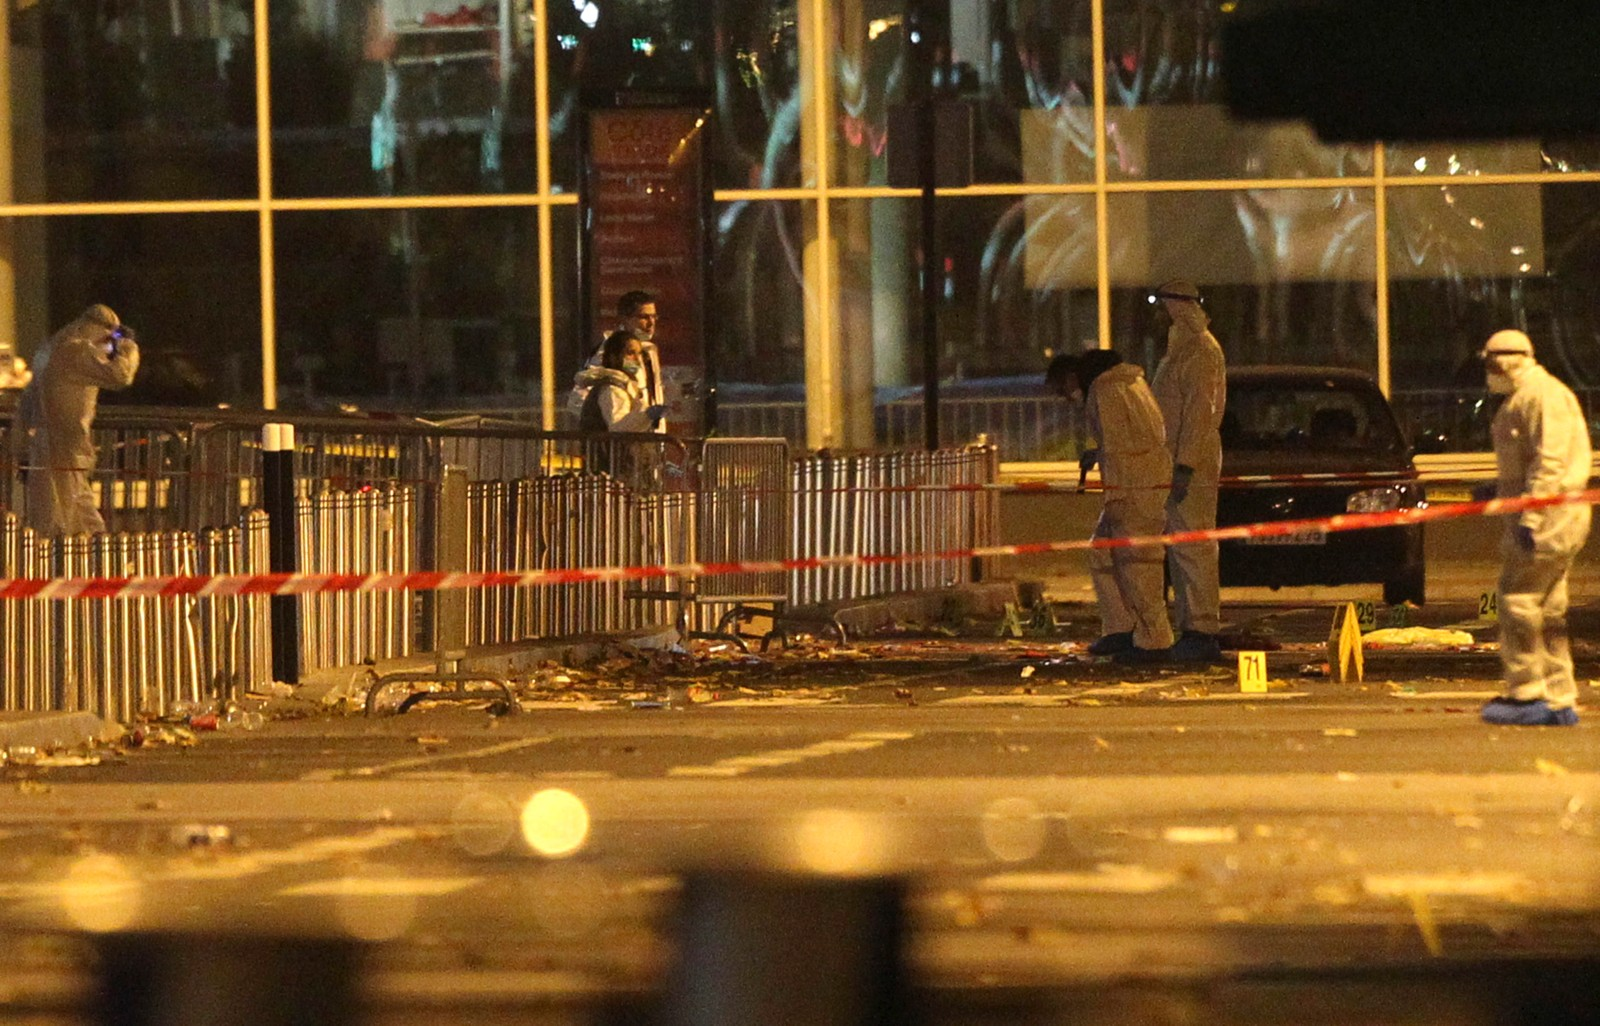 STADION: Frankrikes president Francois Hollande var til stede på Stade de France under landskampen. Politihelikoptre sirklet rundt i lufta da han ble fraktet i sikkerhet, ifølge TV-kanalen i-Tele.